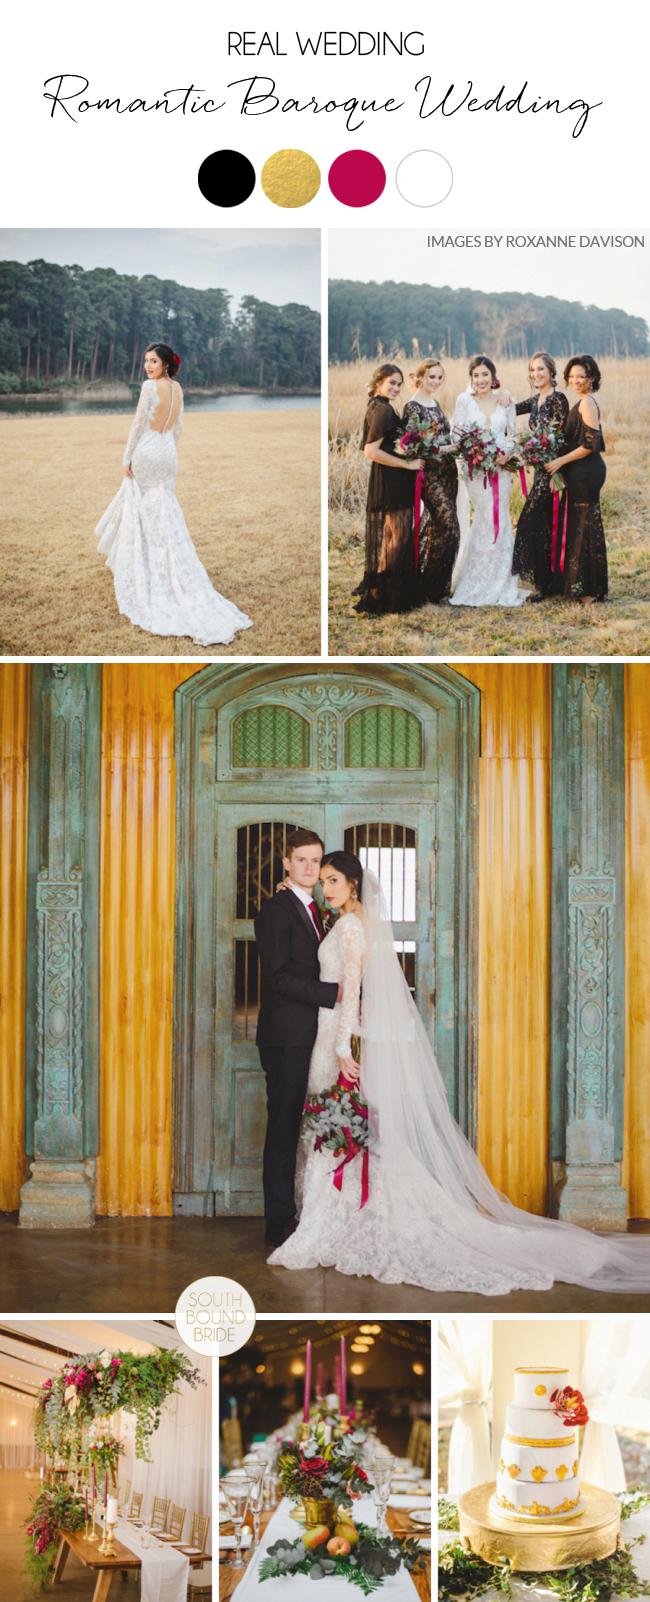 Romantic Baroque Wedding at Waterwoods by Roxanne Davison